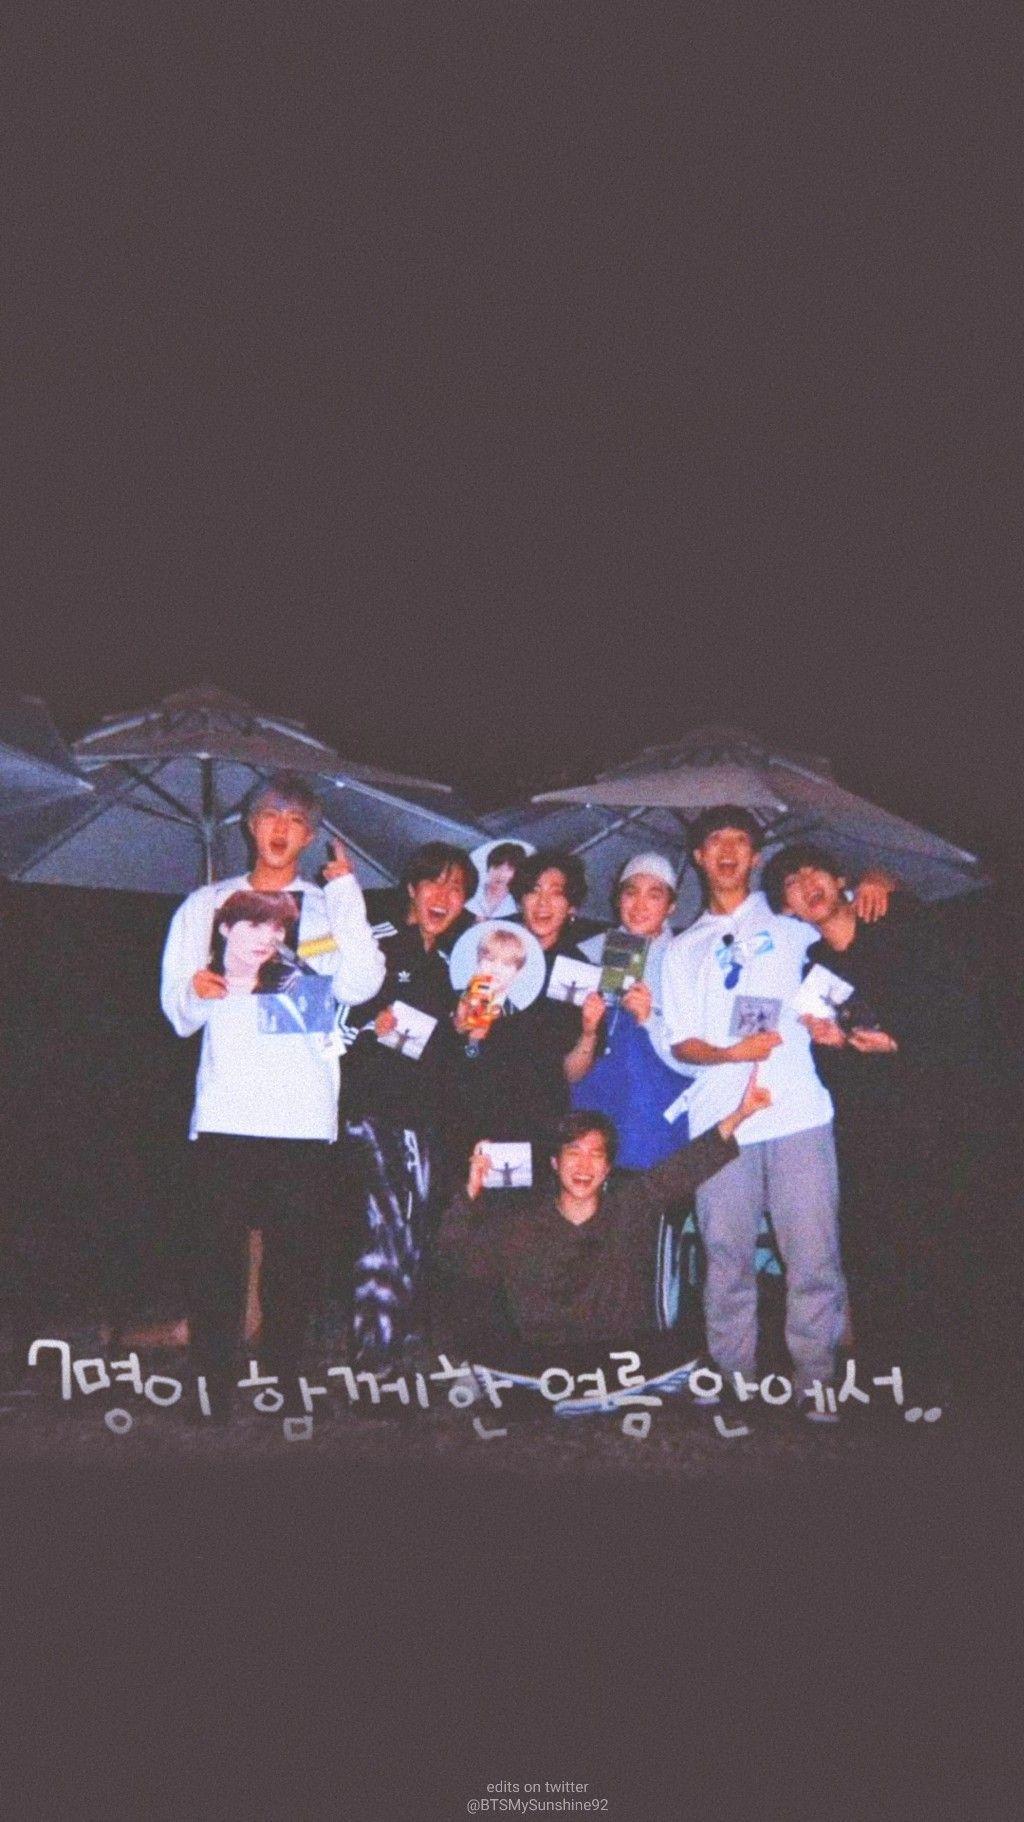 Bts Run Bts 2019 Epi 85 Behind The Scene Yoongi Seokjin Kim Seokjin Run bts phone wallpaper